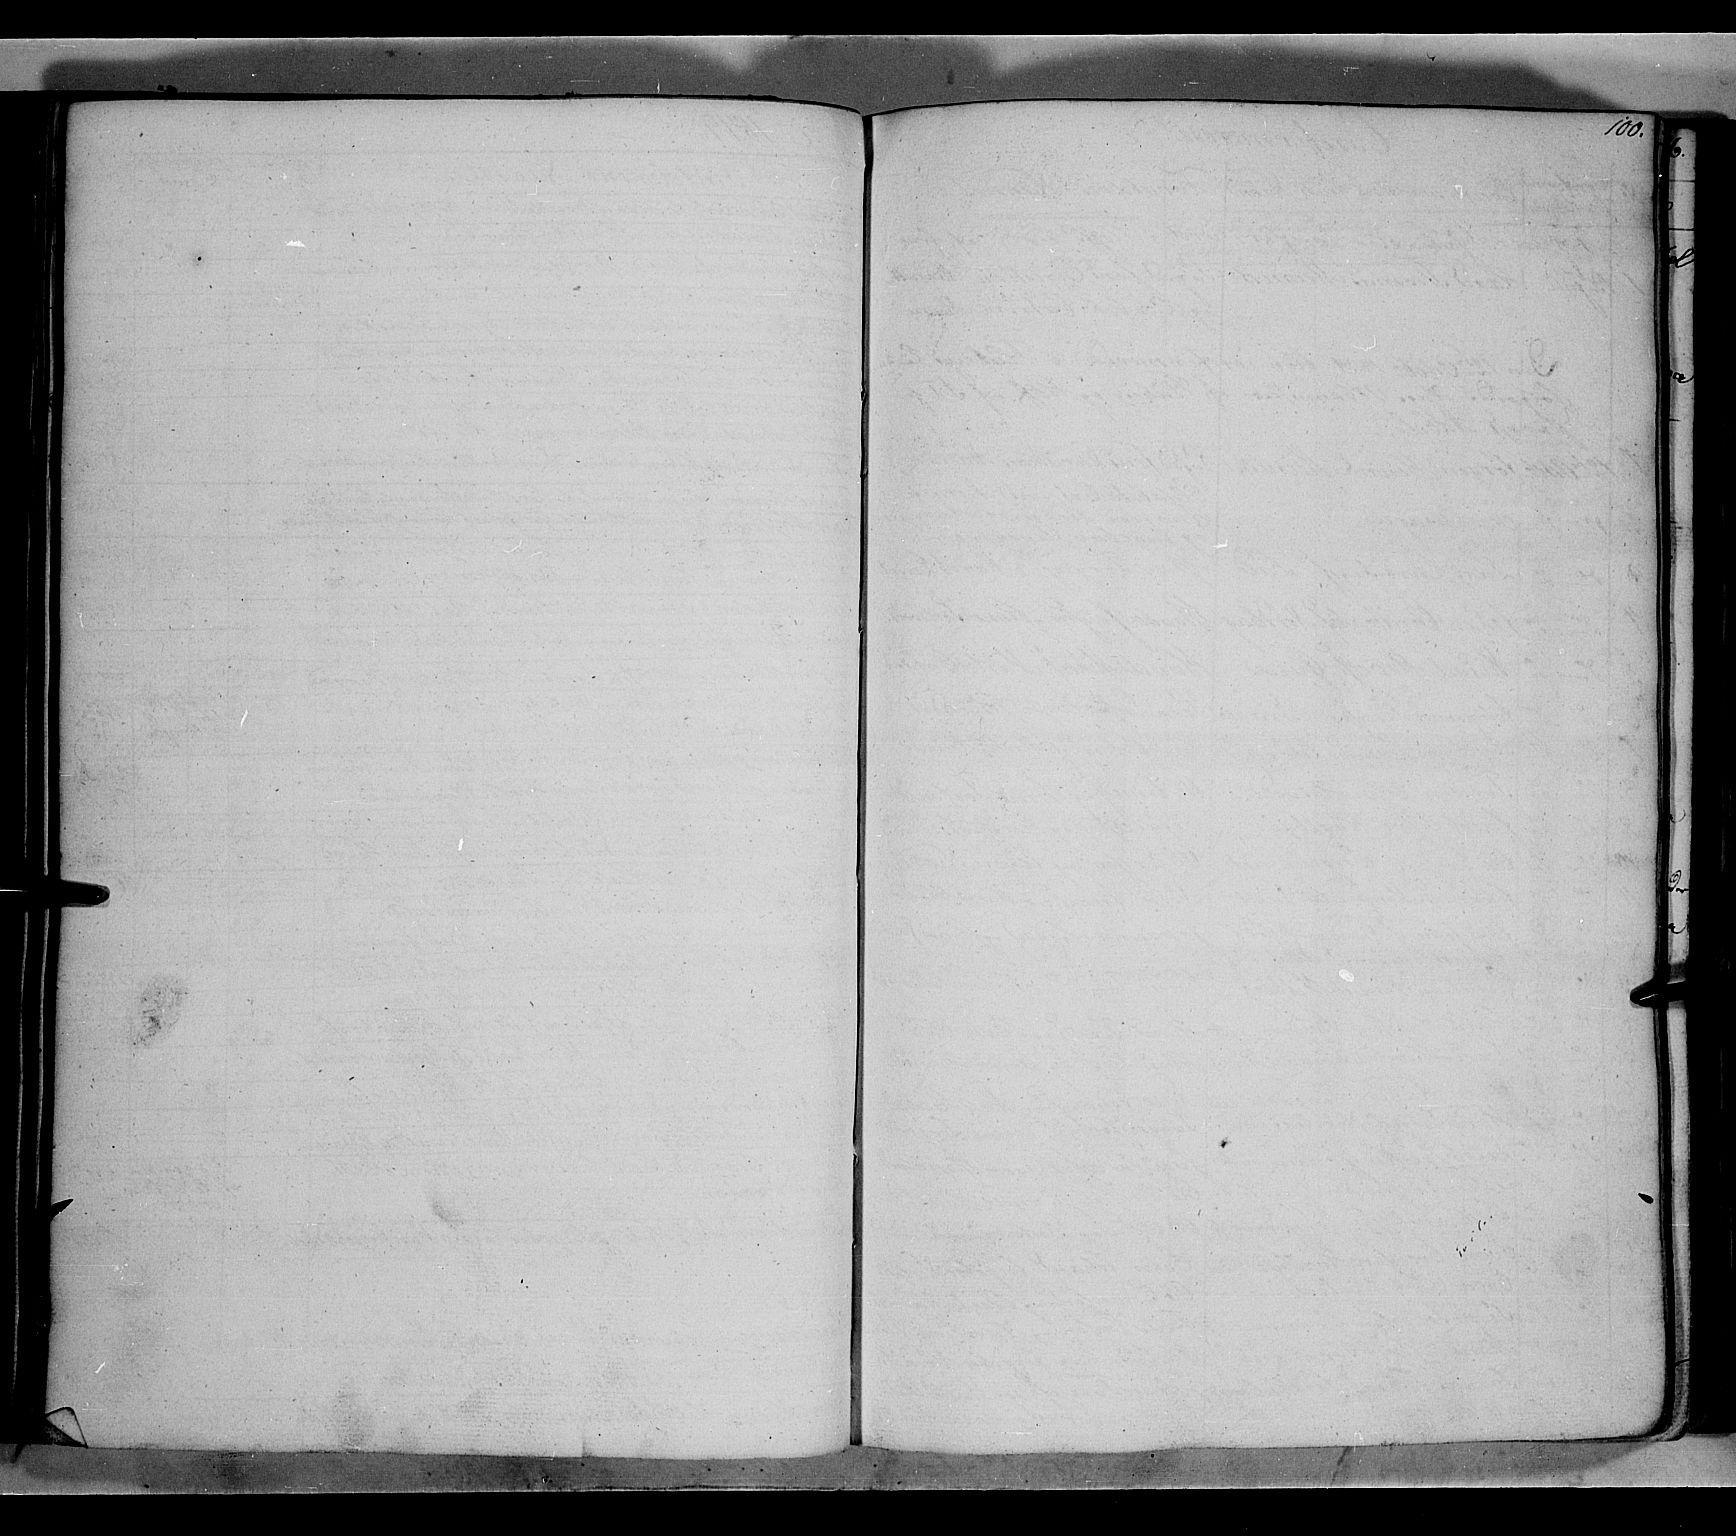 SAH, Land prestekontor, Klokkerbok nr. 2, 1833-1849, s. 100